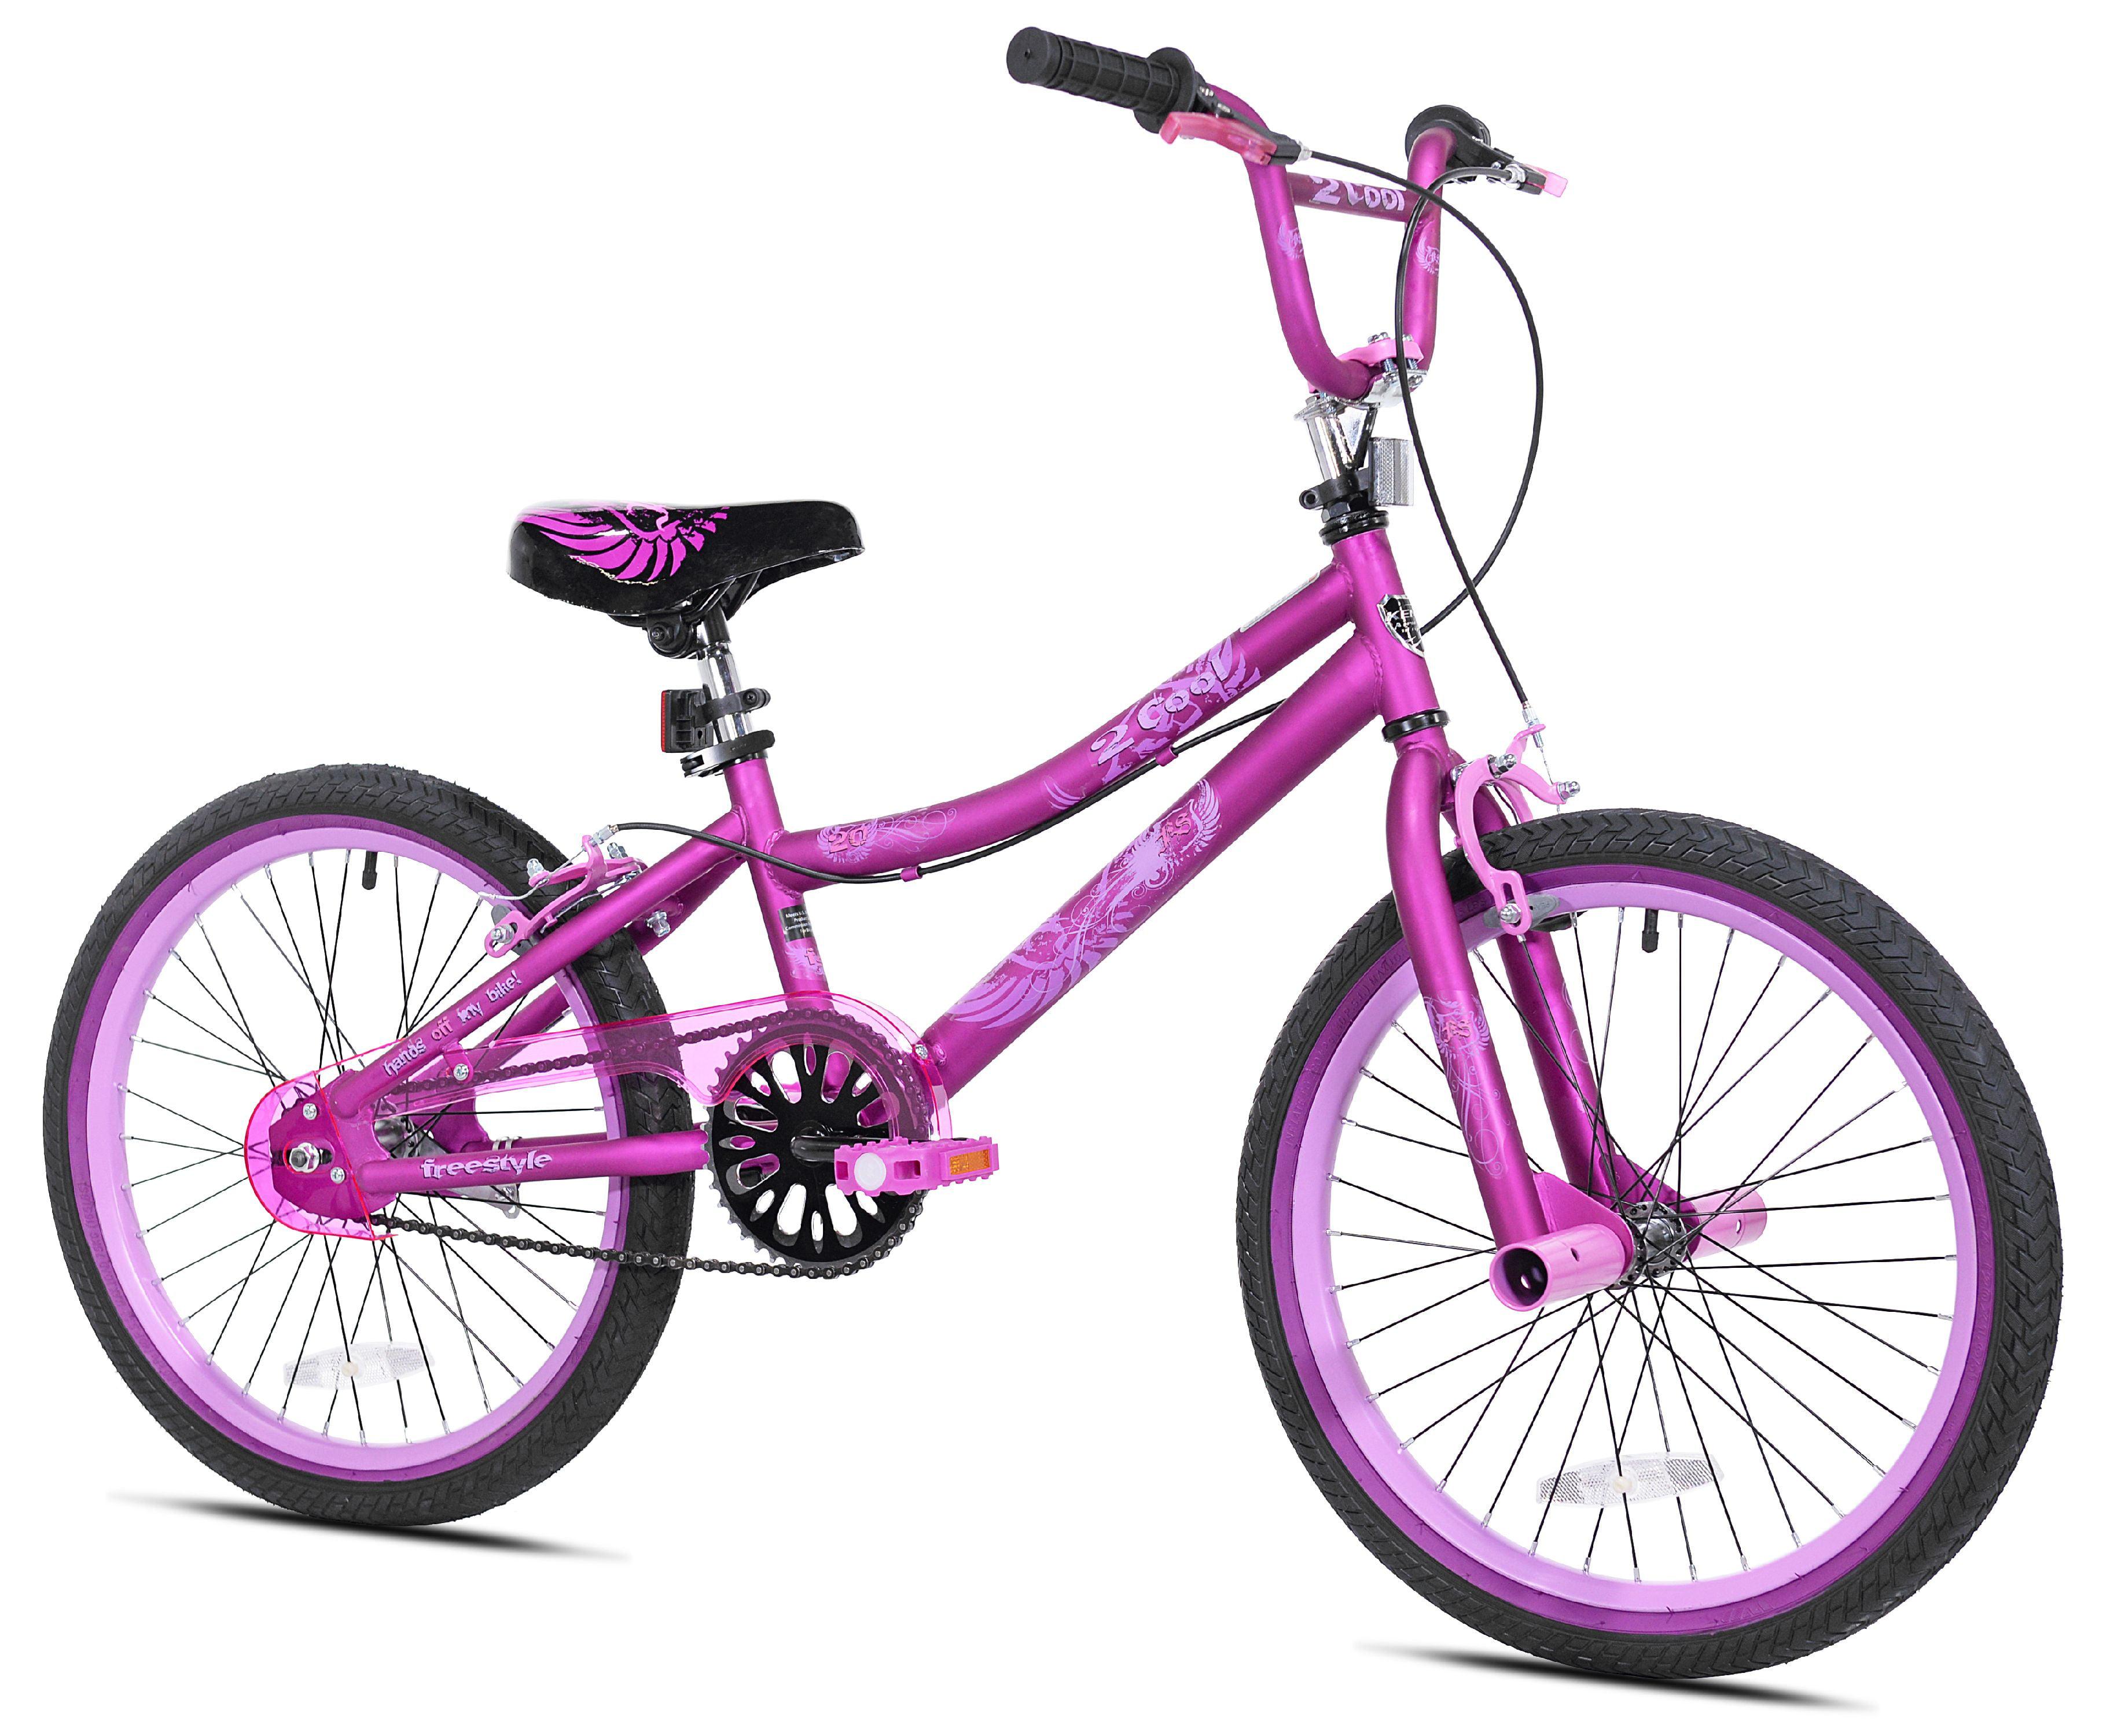 "Kent 20"" 2 Cool Girls' BMX Bike, Satin Purple by Kent International Inc"